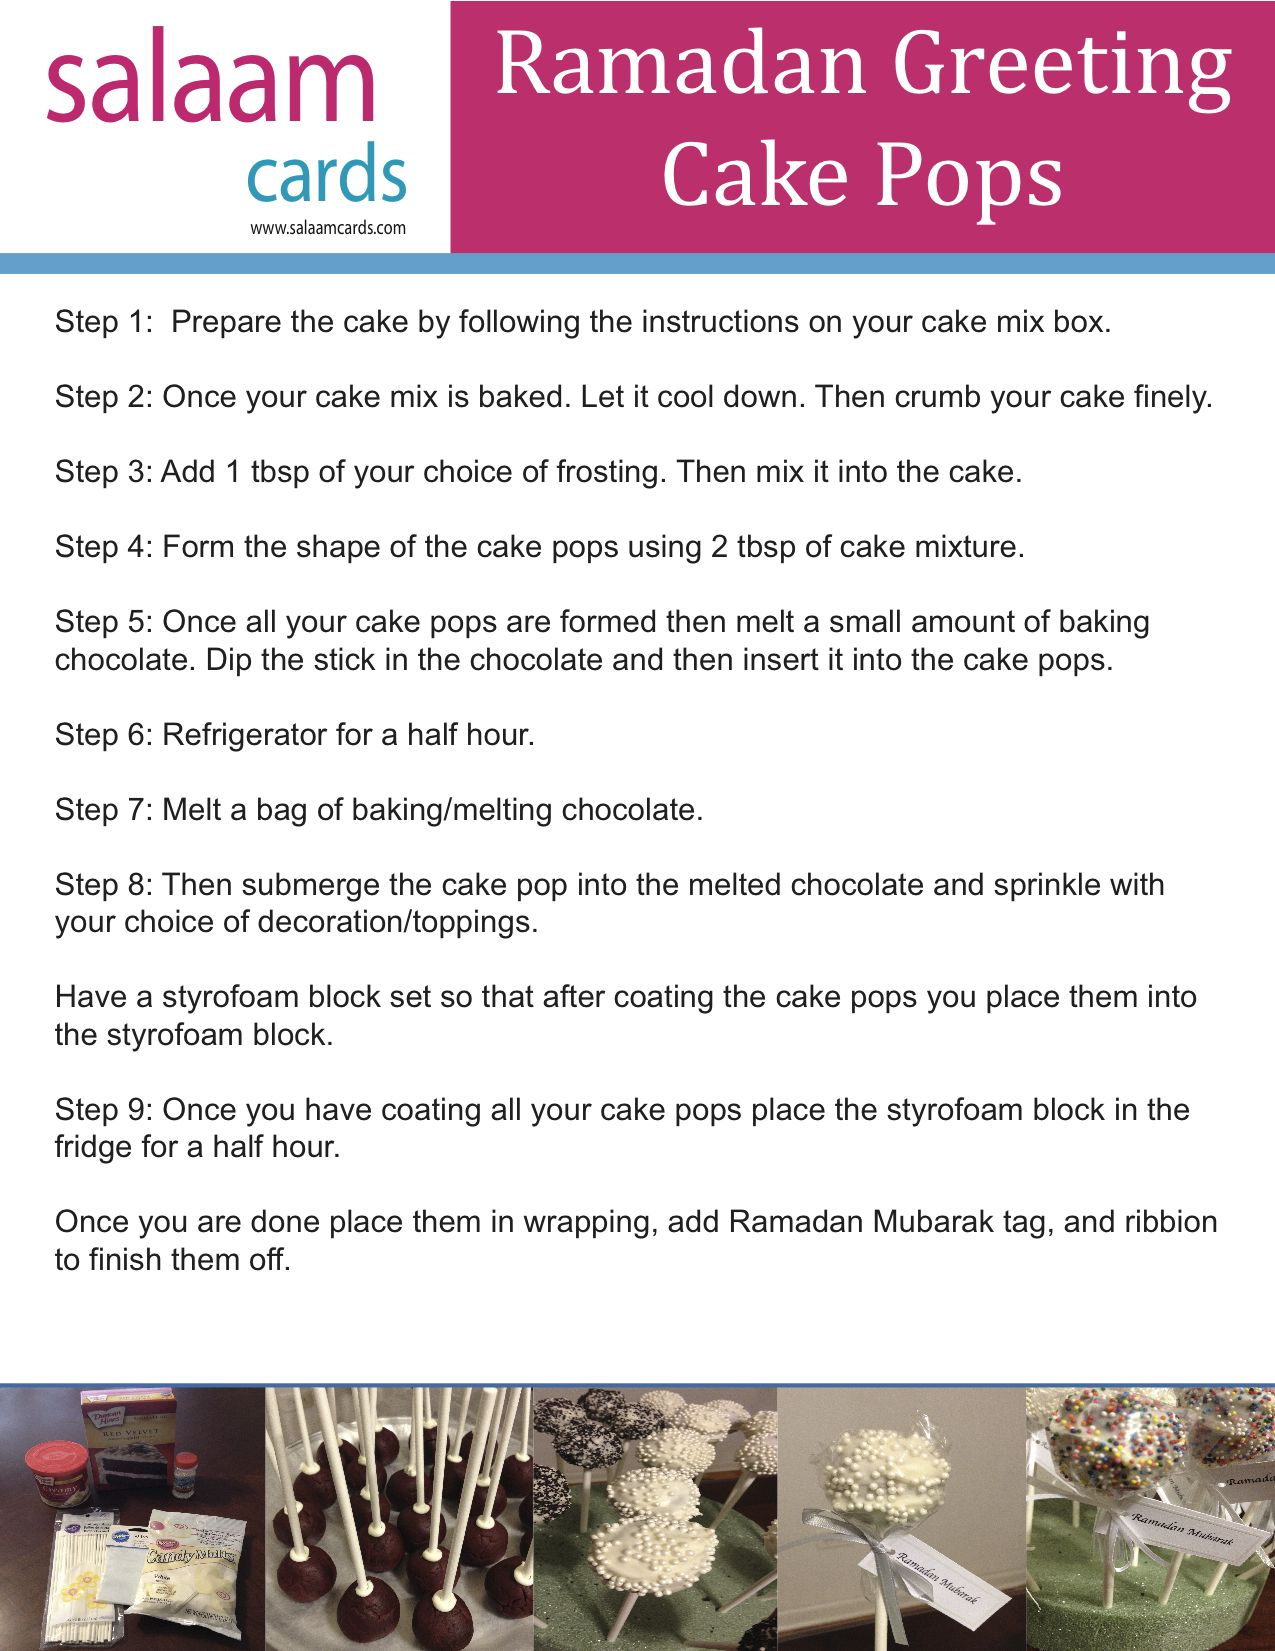 How To Guide Ramadan Greeting Cake Pops Ramadangreeting Cakepops